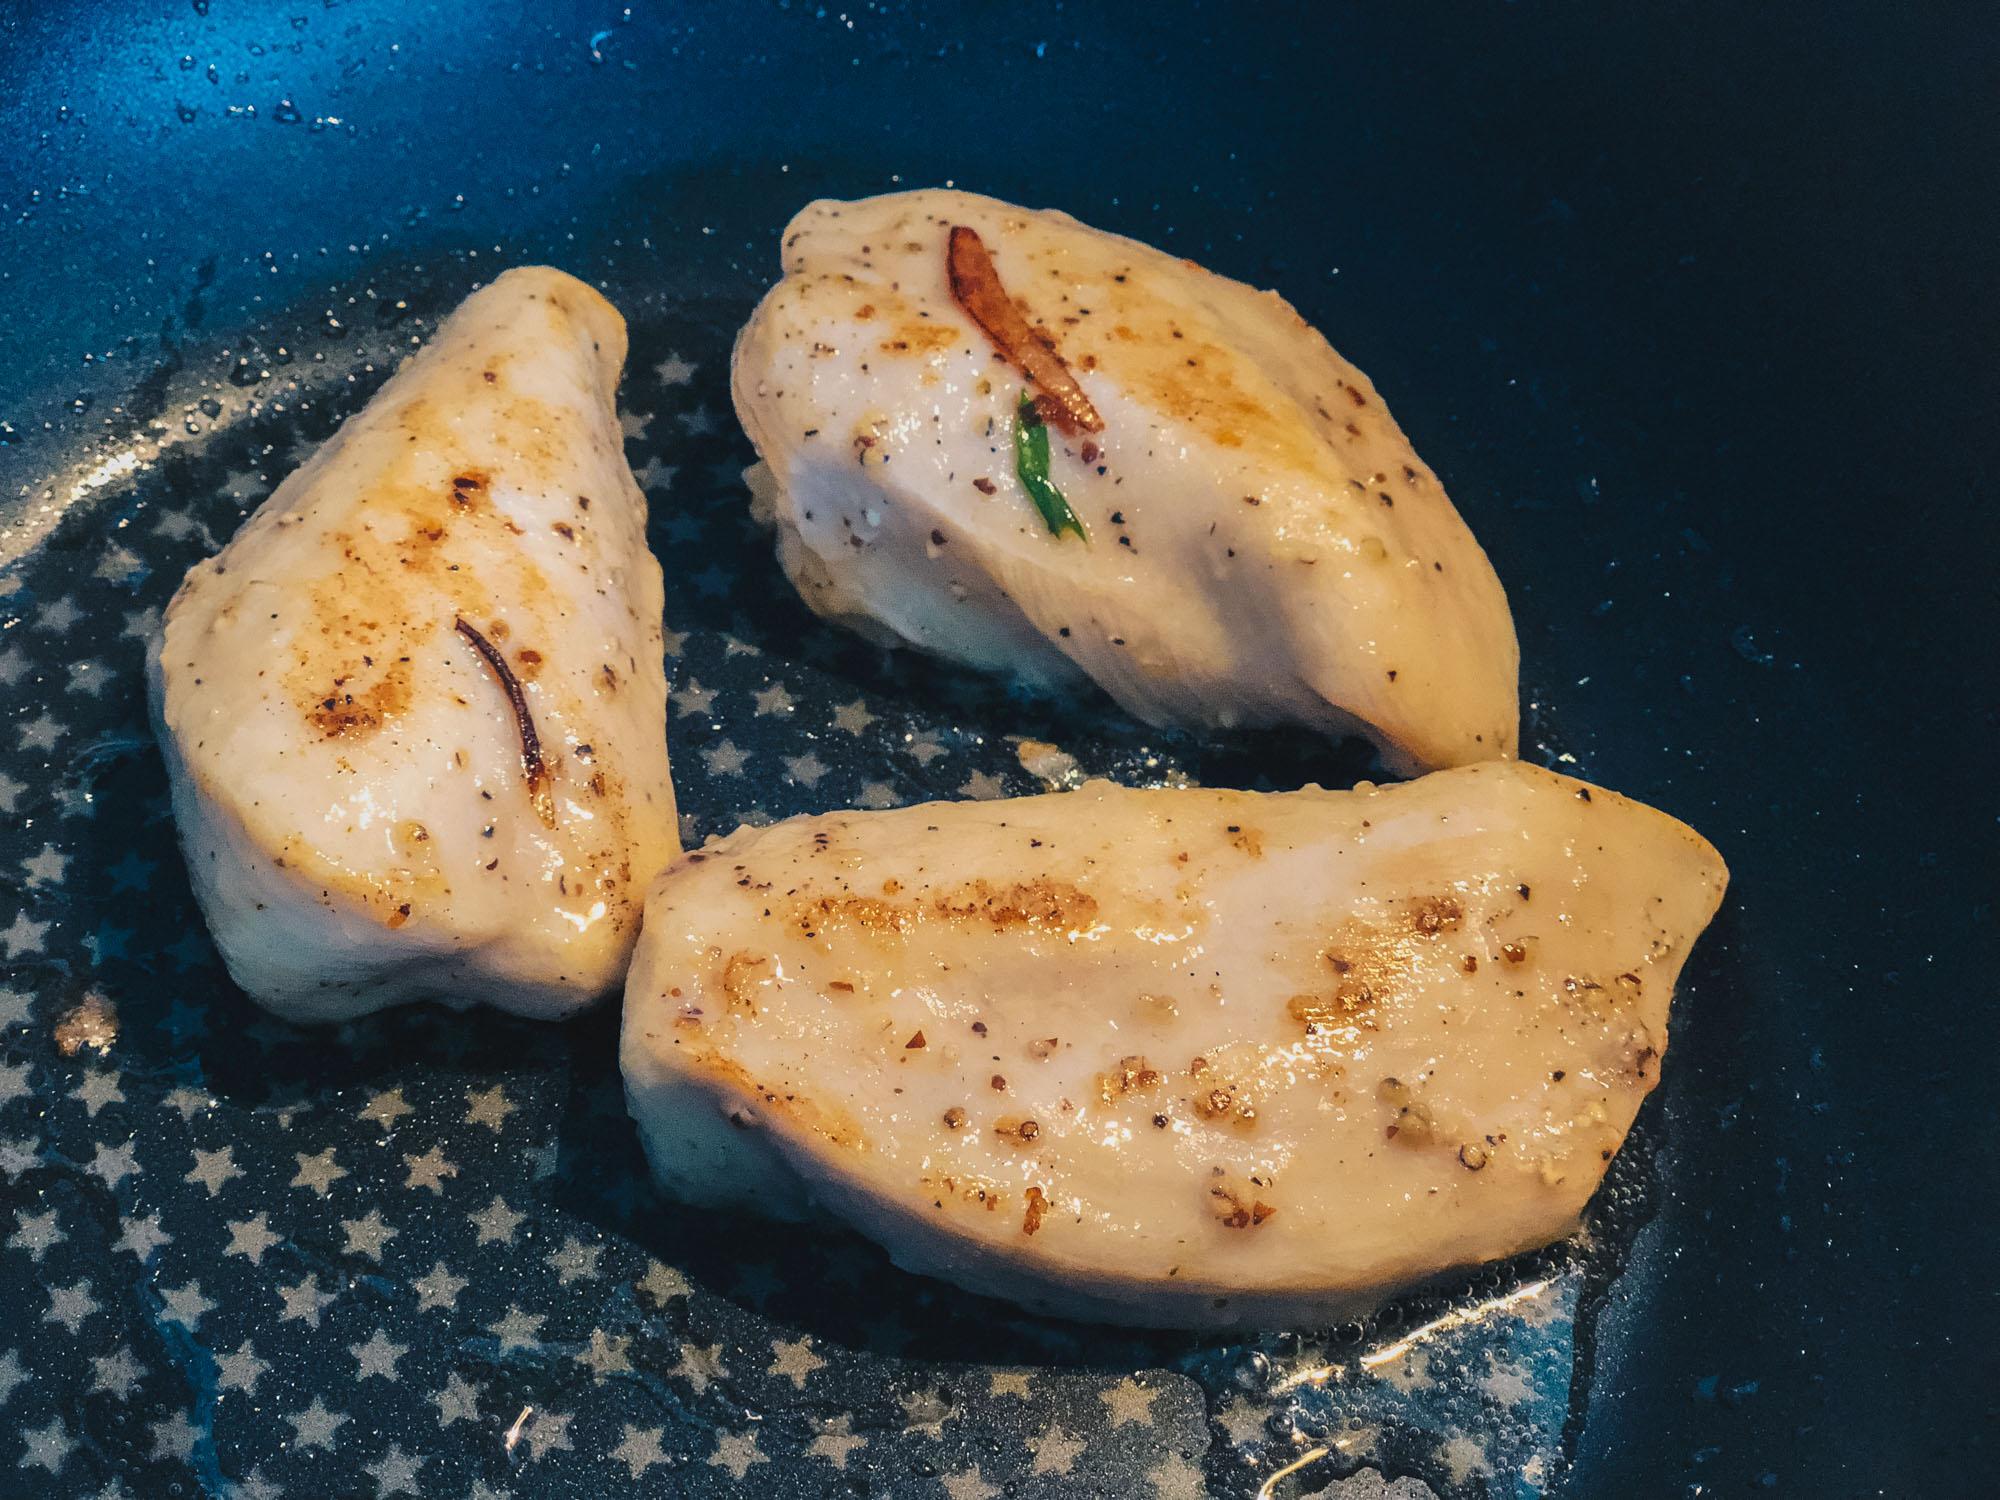 sadia-grilled-chicken-breast-darrenbloggie